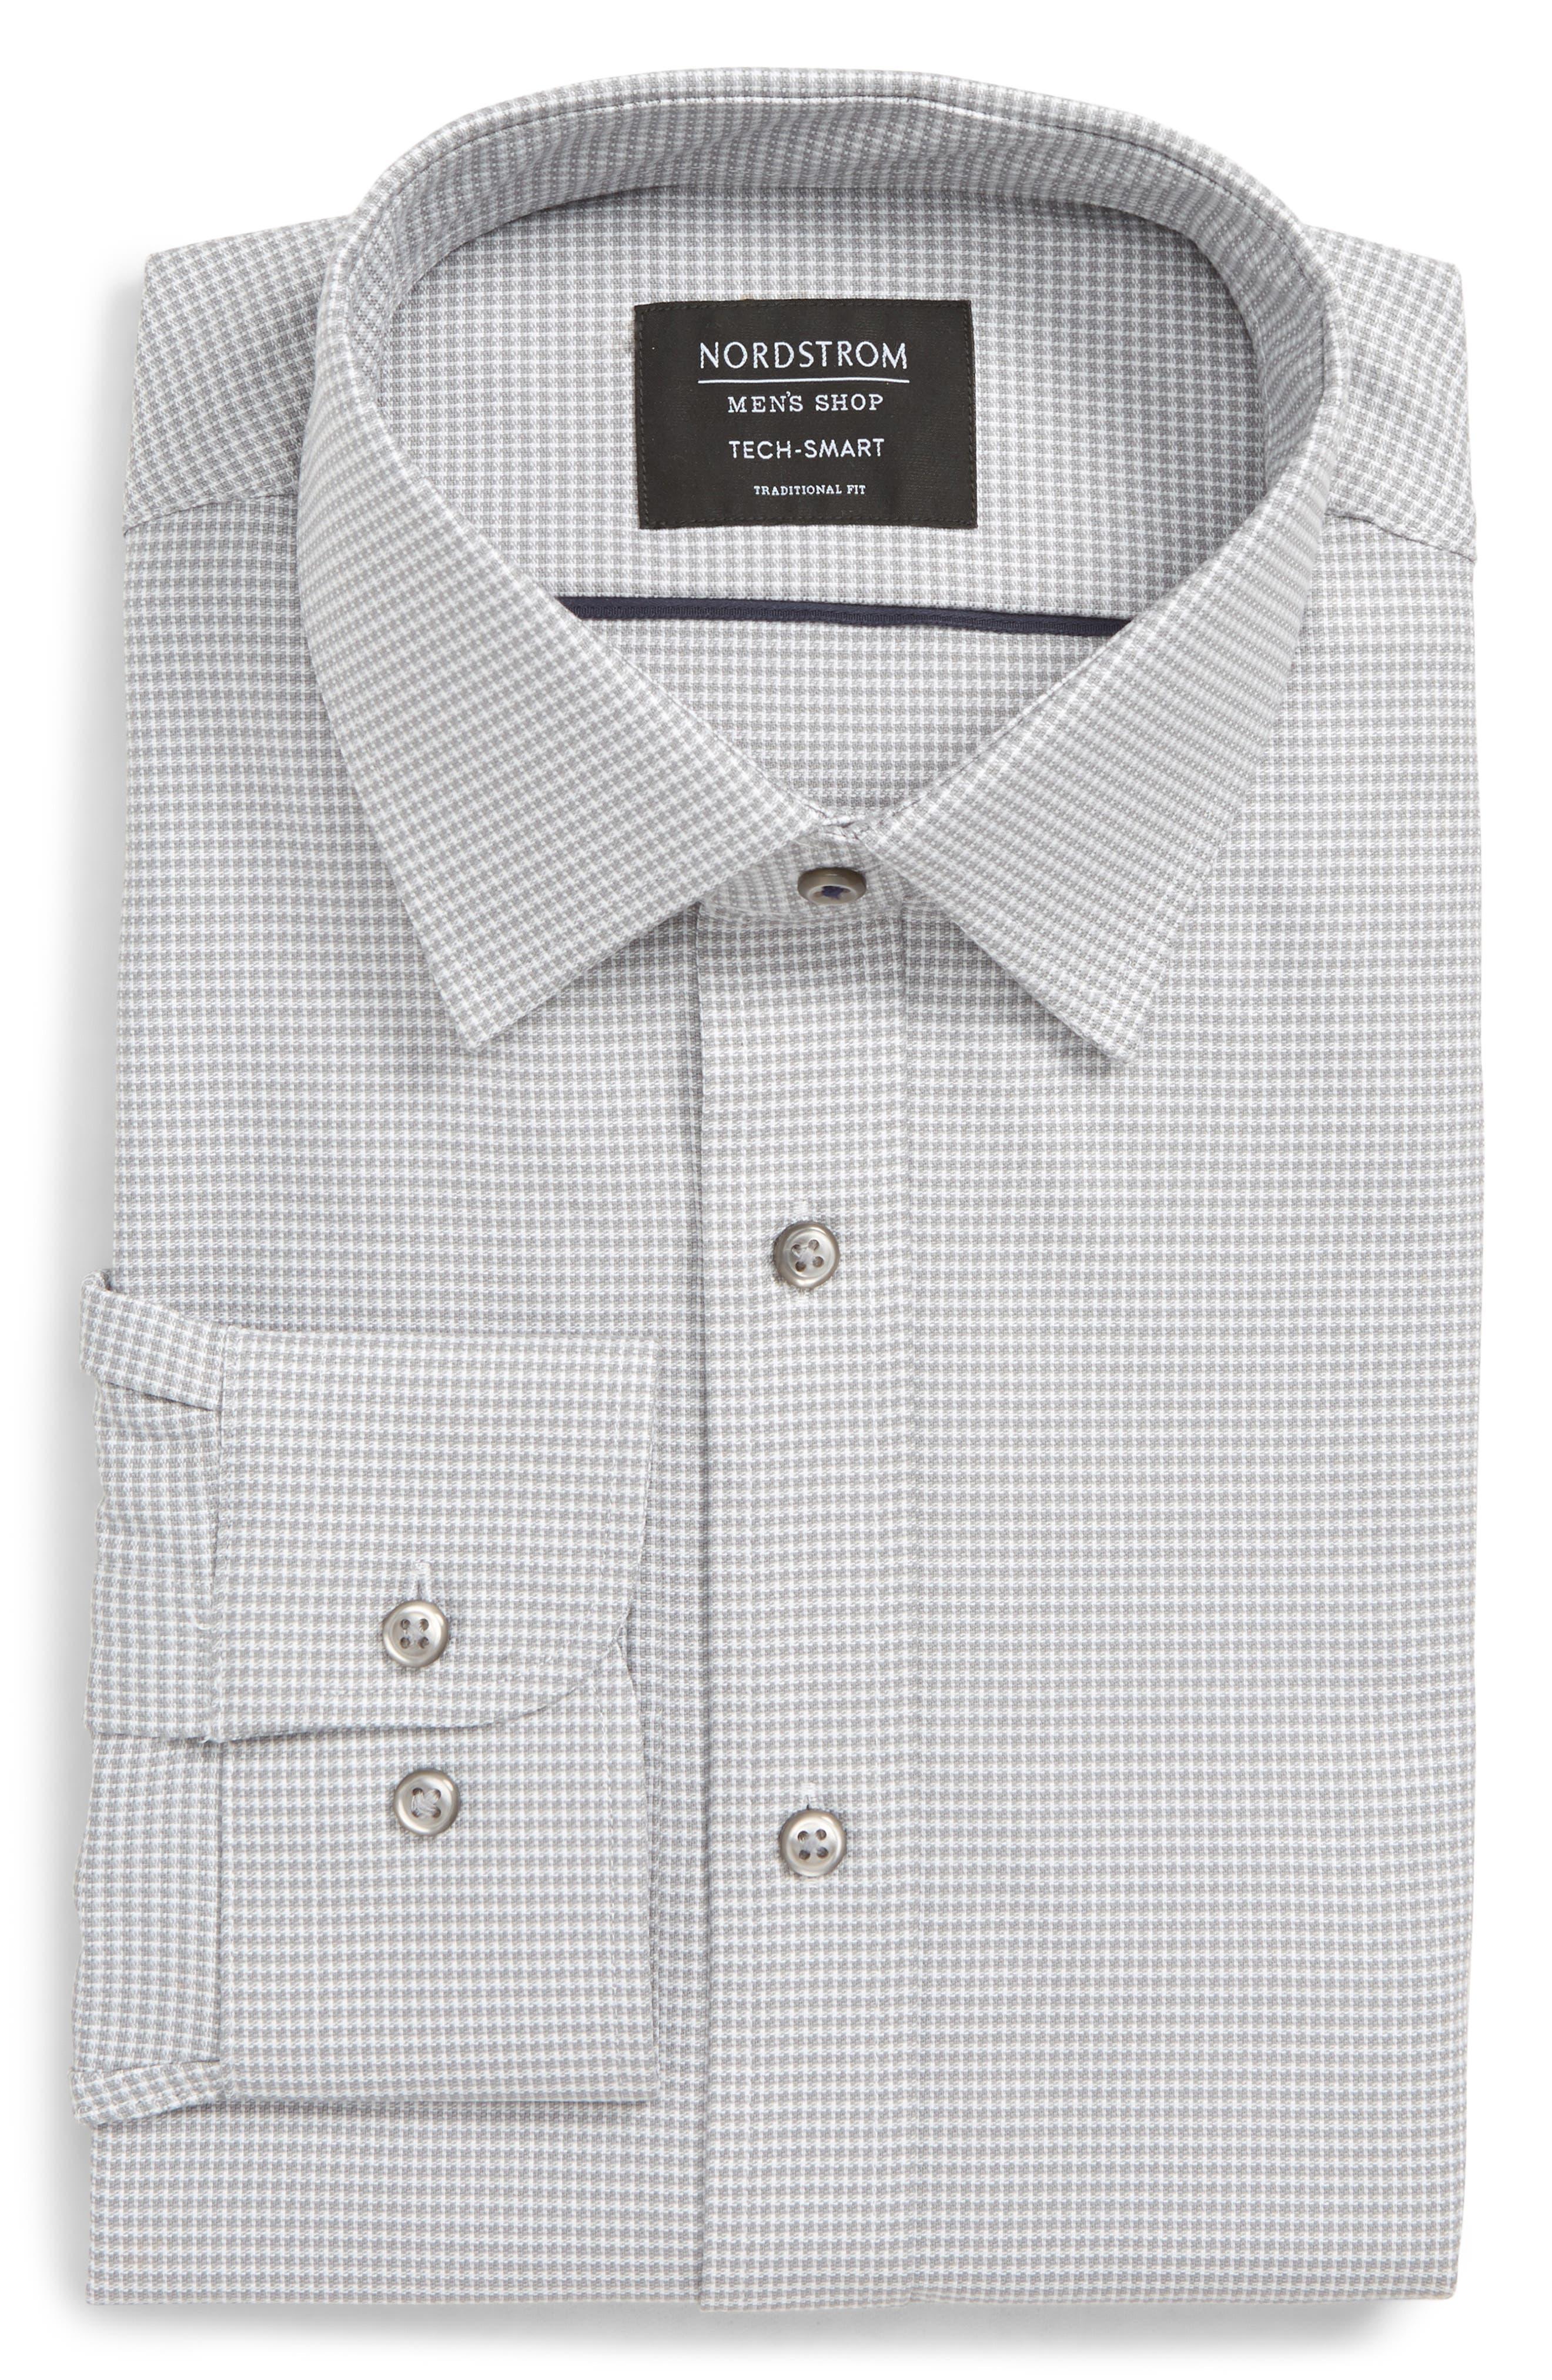 NORDSTROM MEN'S SHOP Tech-Smart Traditional Fit Stretch Solid Dress Shirt, Main, color, 050